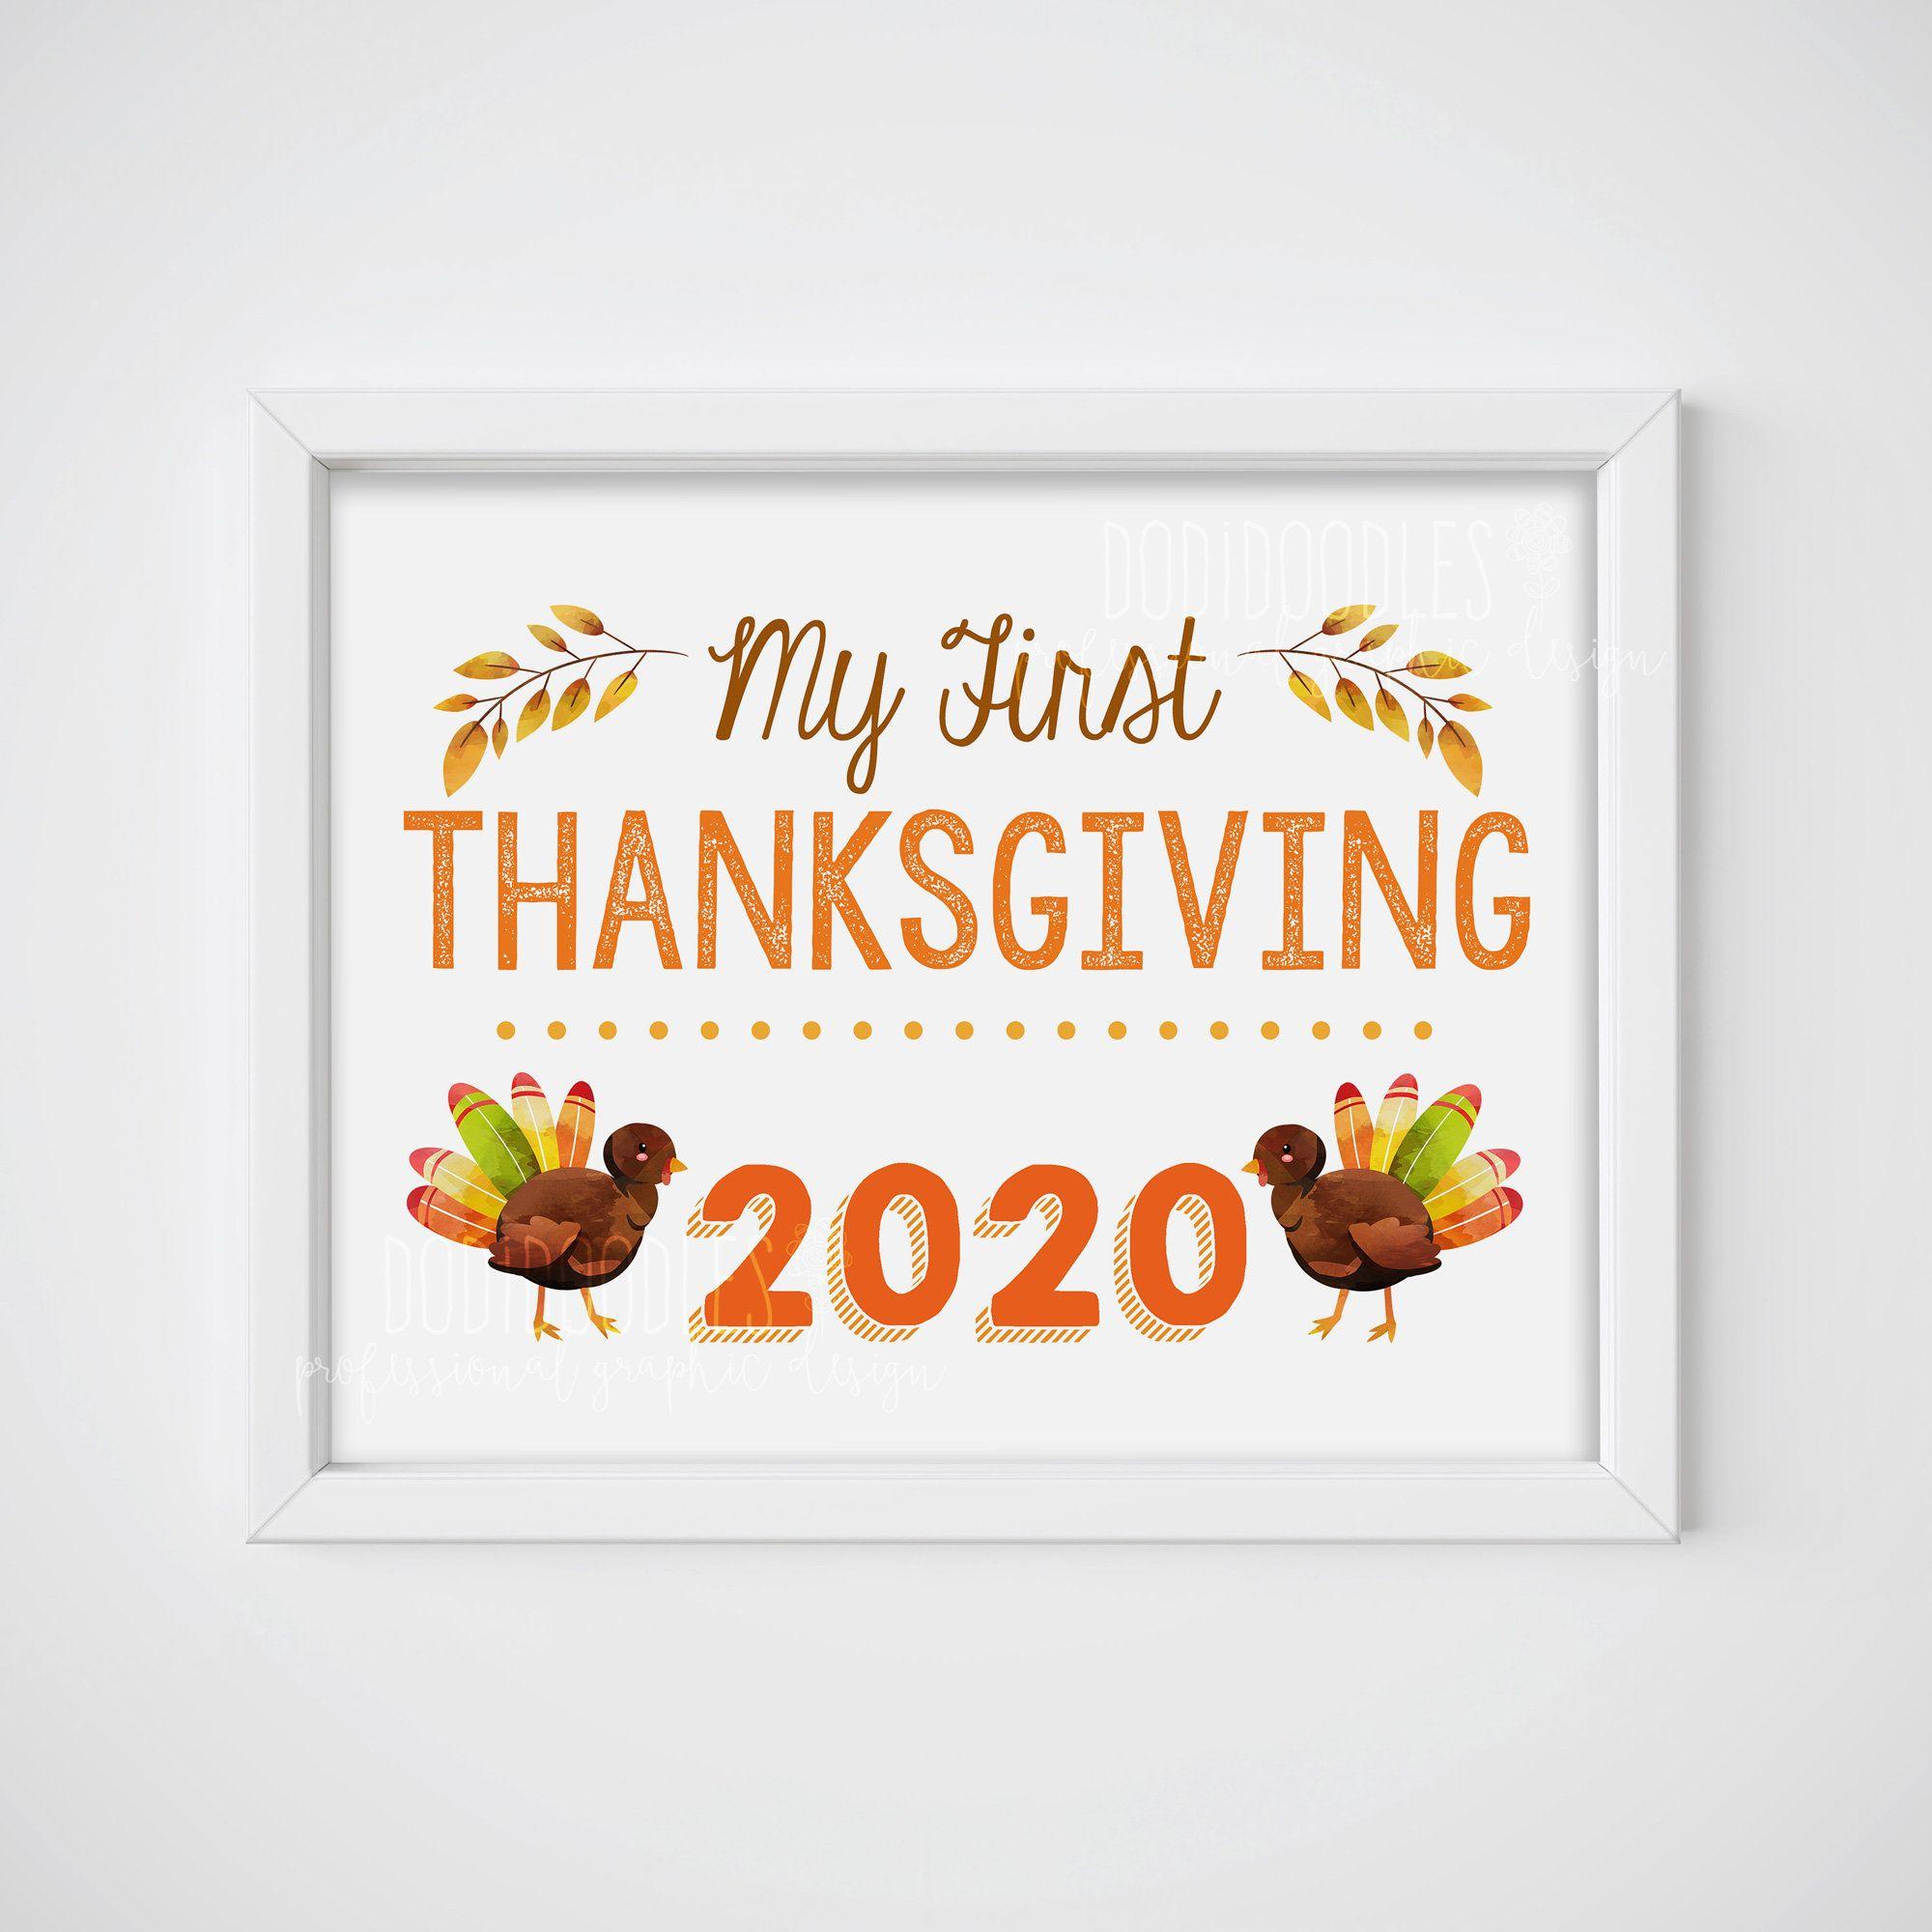 My First Thanksgiving First Thanksgiving Thanksgiving 2020 Etsy In 2020 Thanksgiving Photo Props Thanksgiving Photos First Thanksgiving